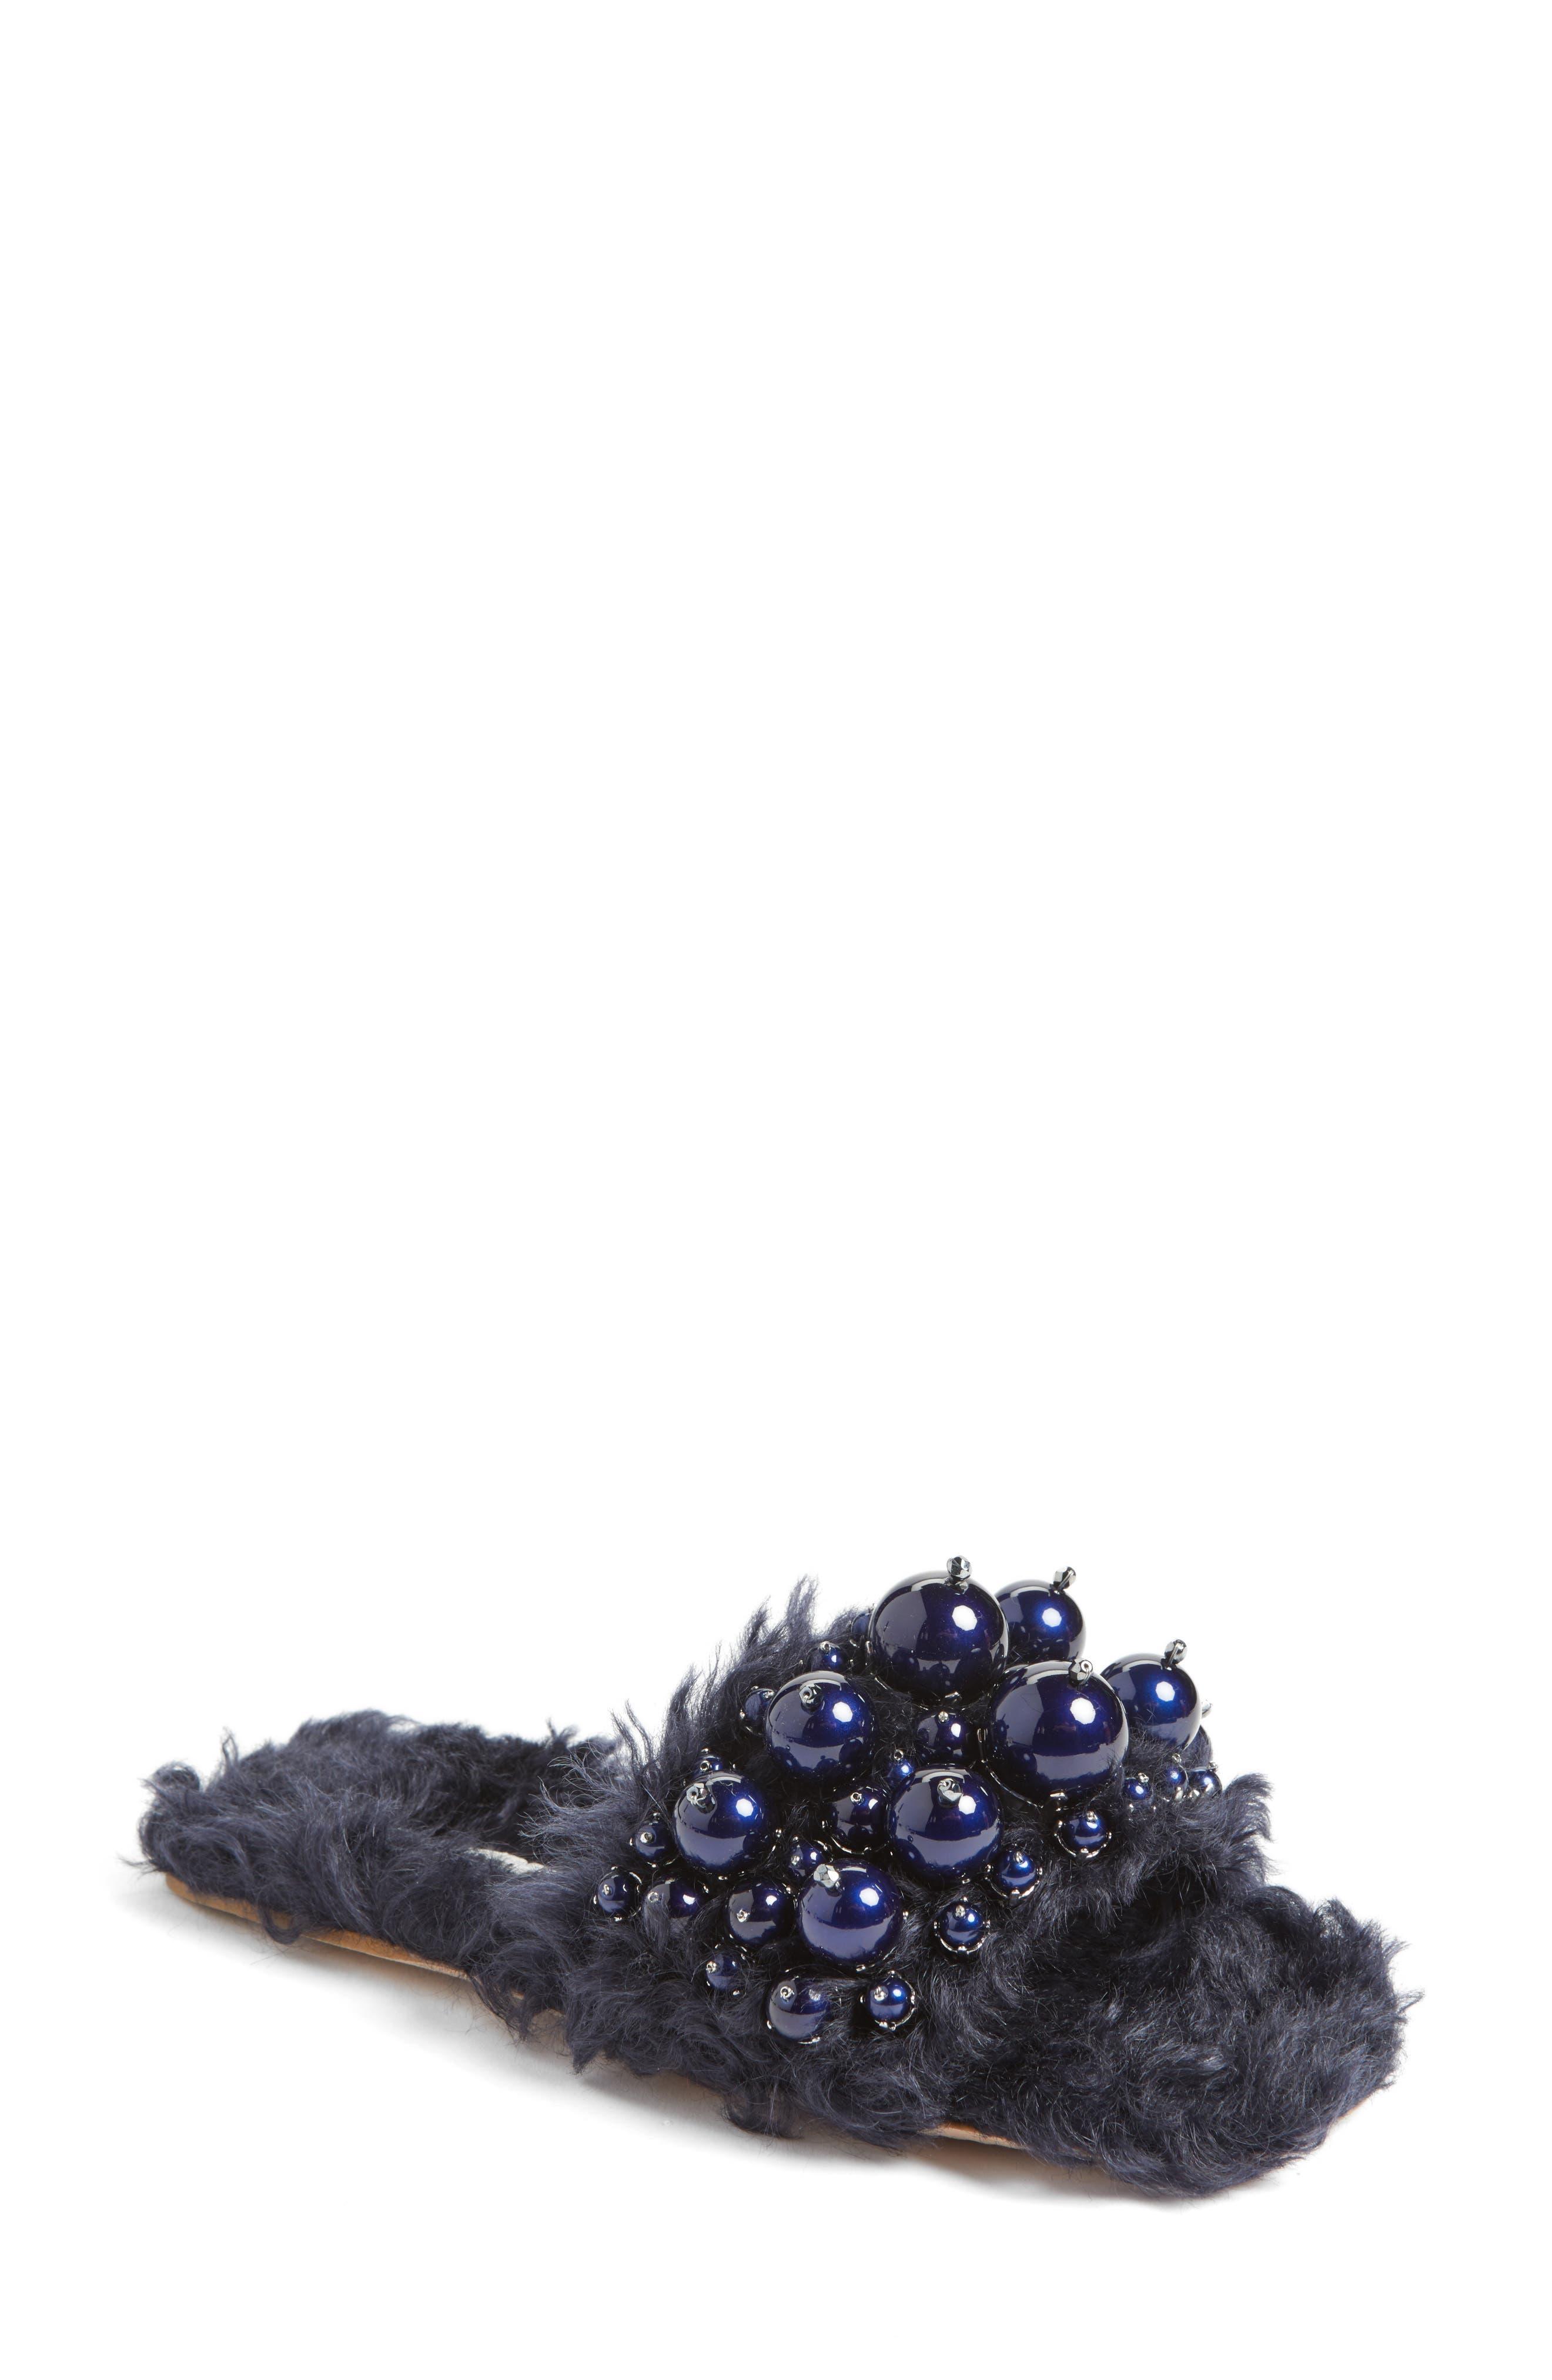 Main Image - Miu Miu Embellished Faux Fur Slipper (Women)